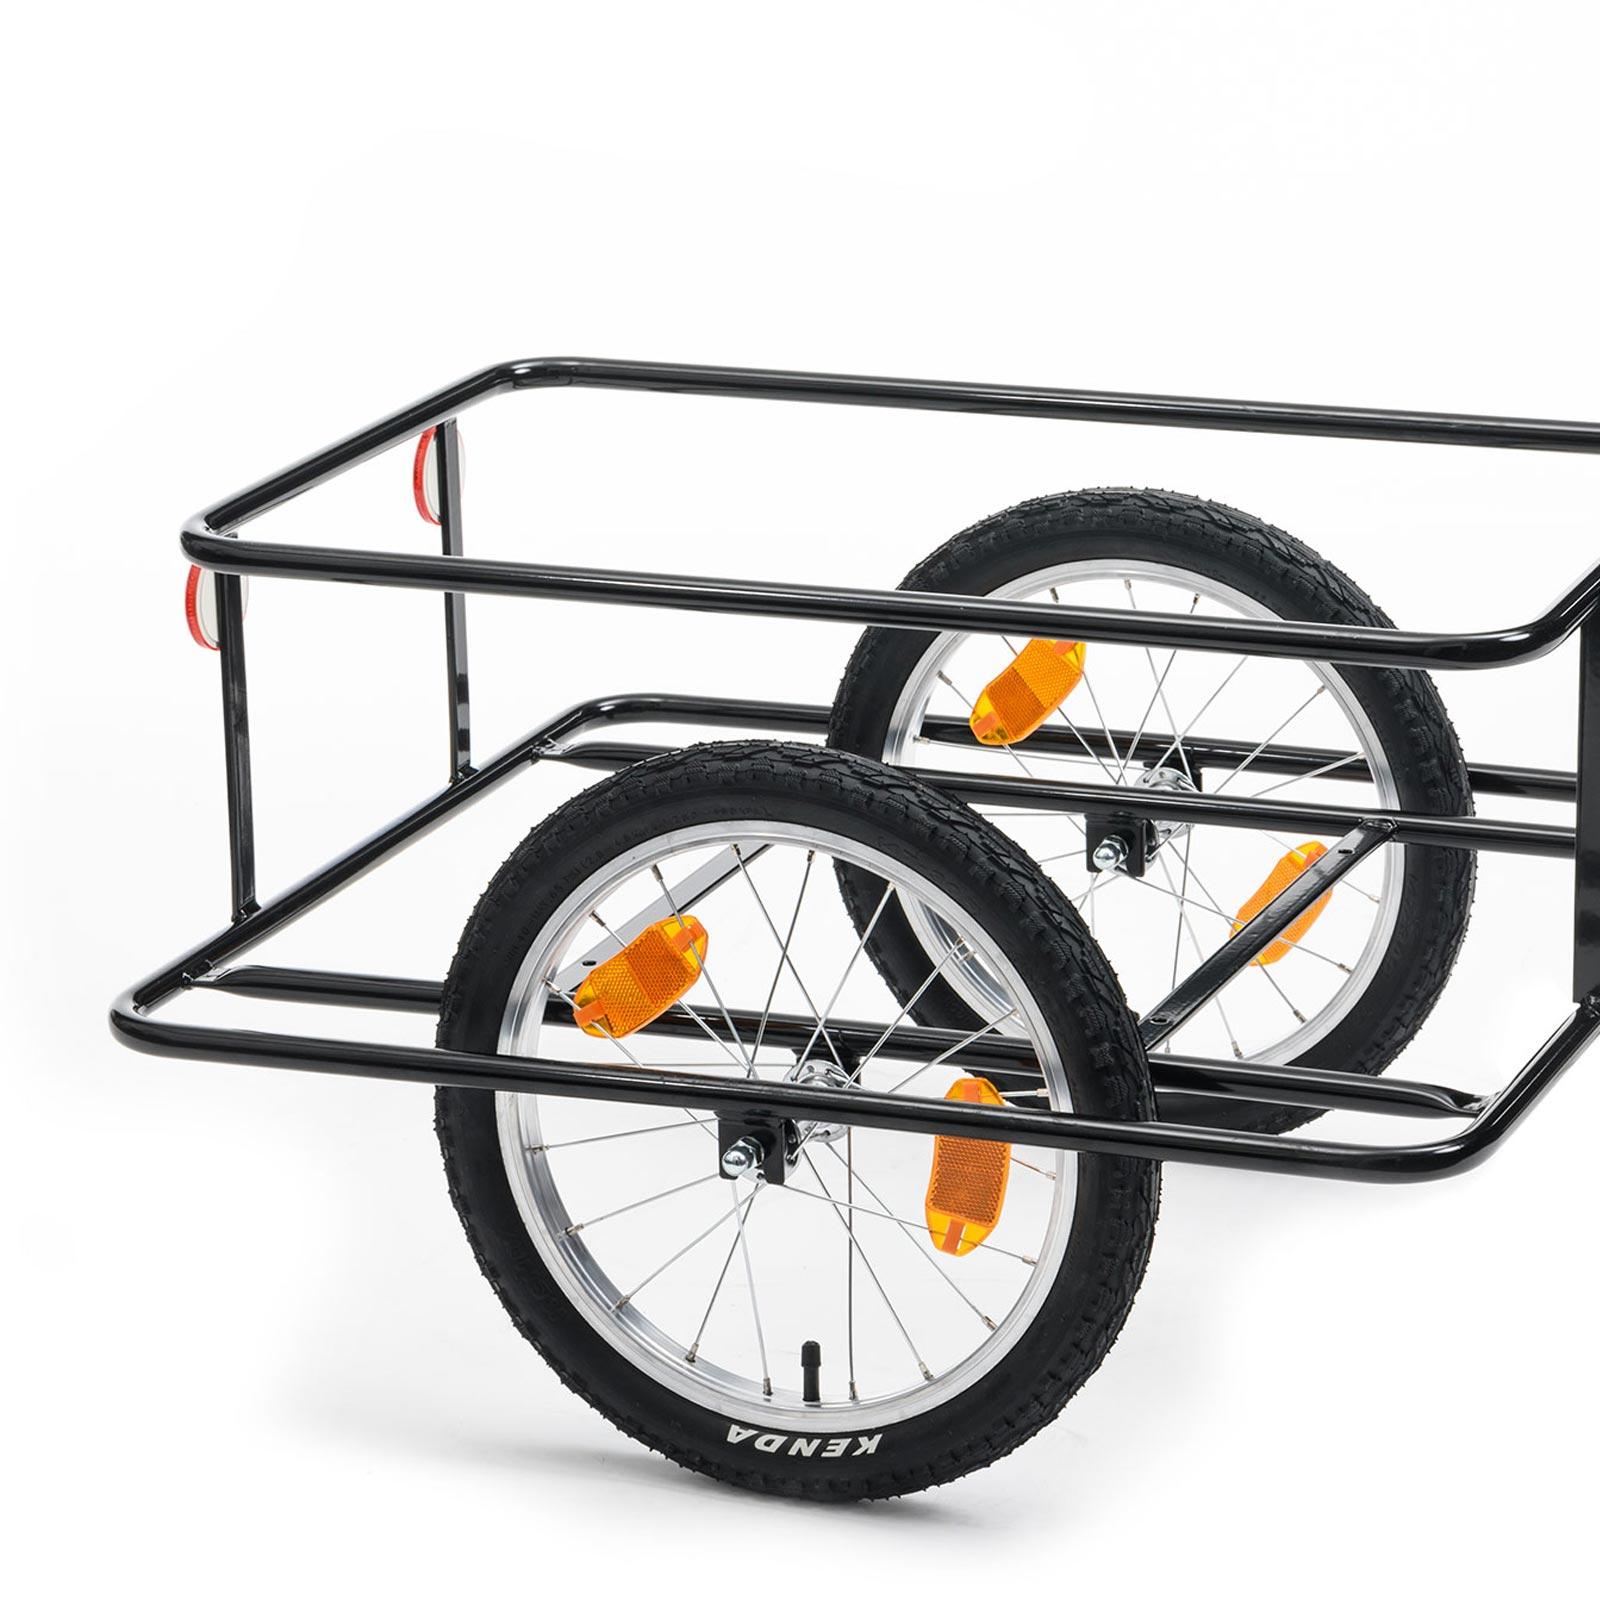 fahrrad lastenanh nger roland big boy tiefdeichsel mit. Black Bedroom Furniture Sets. Home Design Ideas